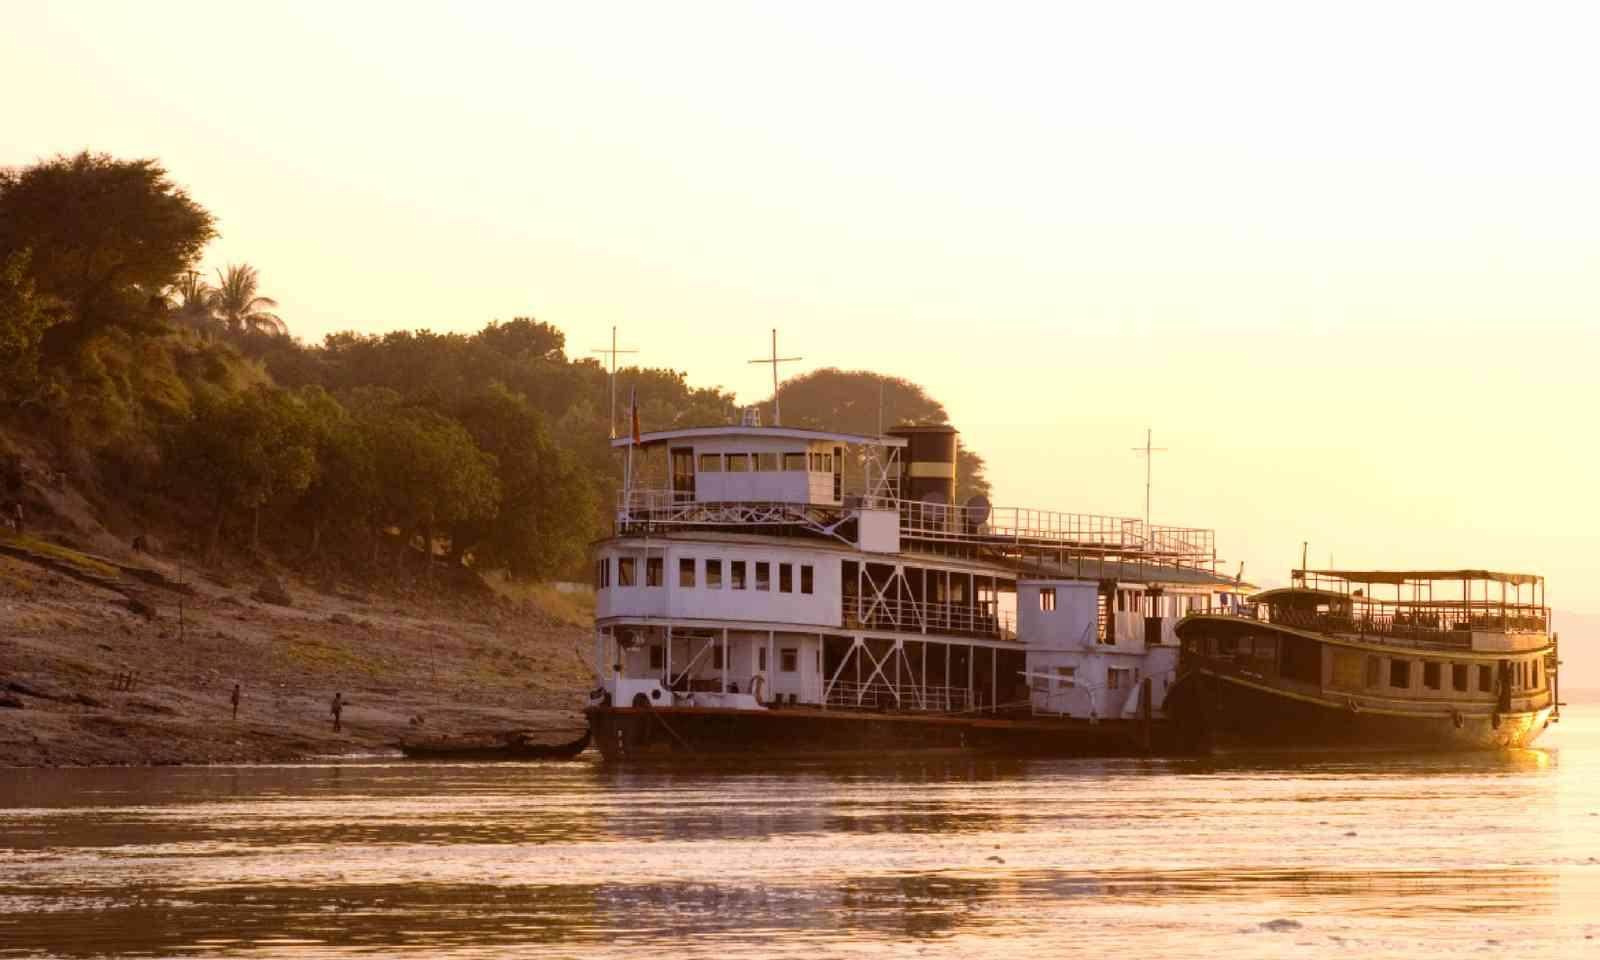 Sunset on the Irrawaddy (Shutterstock)